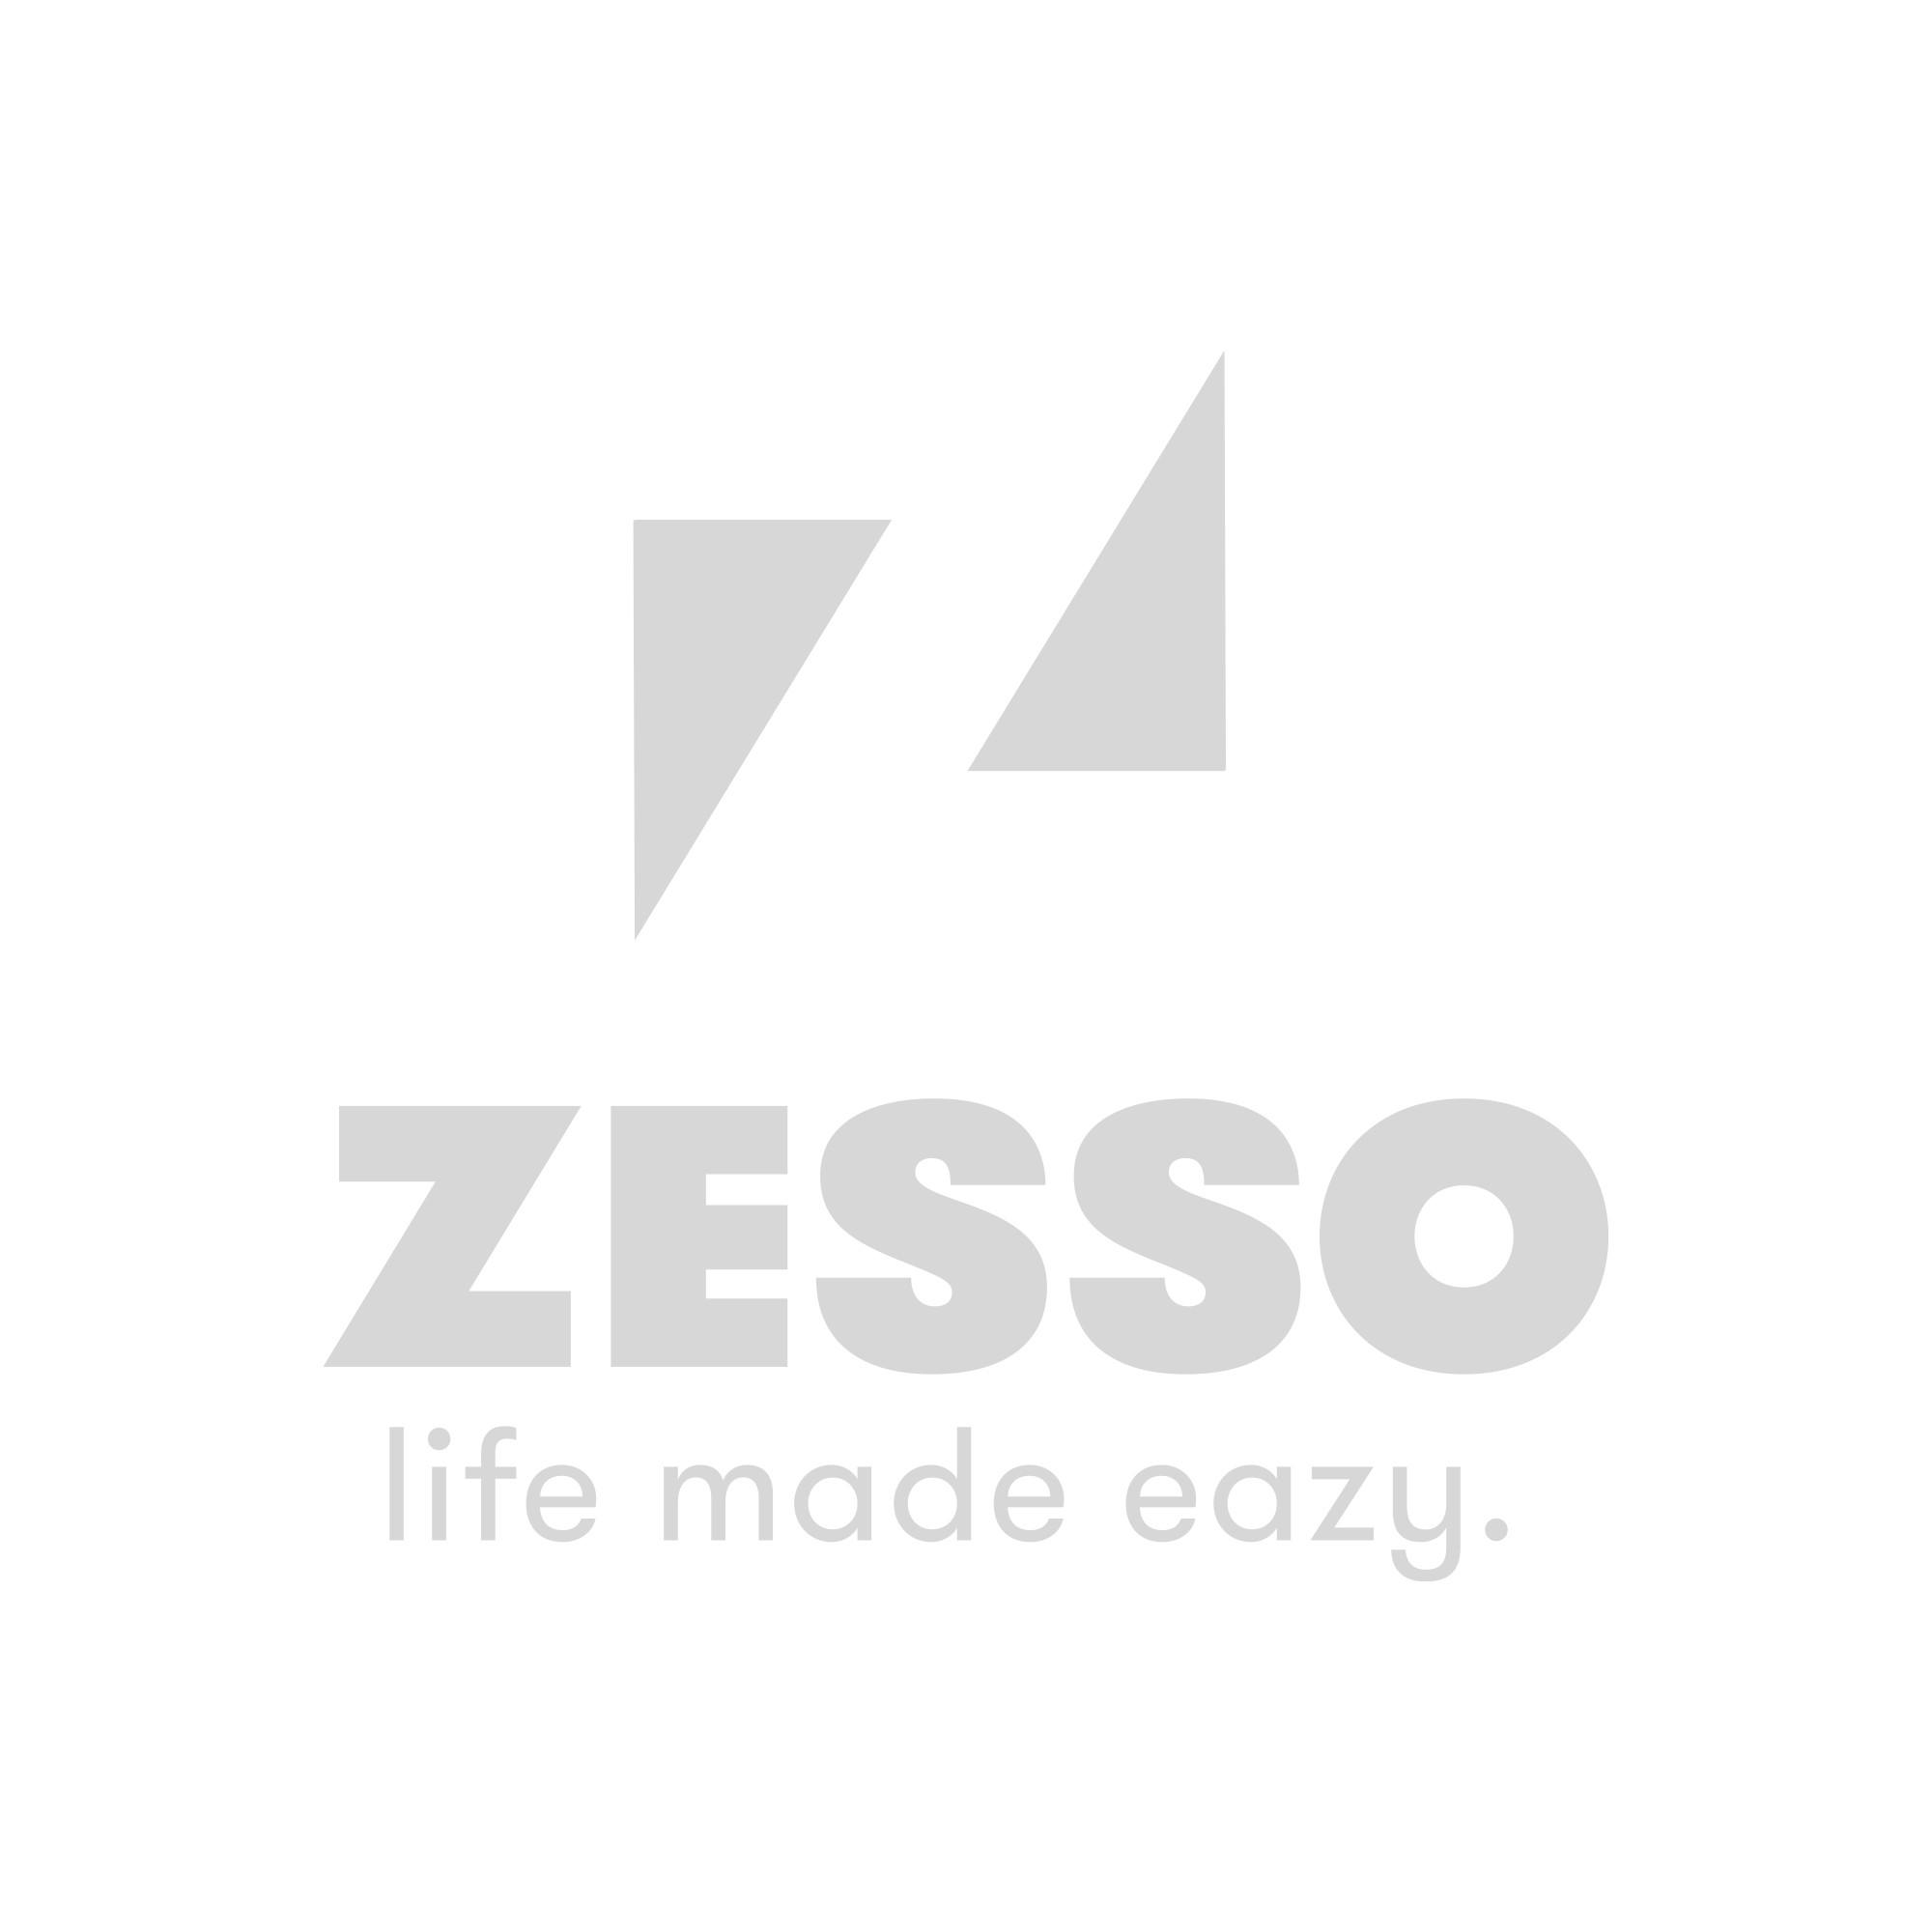 Babymoov Stoomkoker - Mixer - Flessenverwarmer Nutribaby+ Industrial Grey